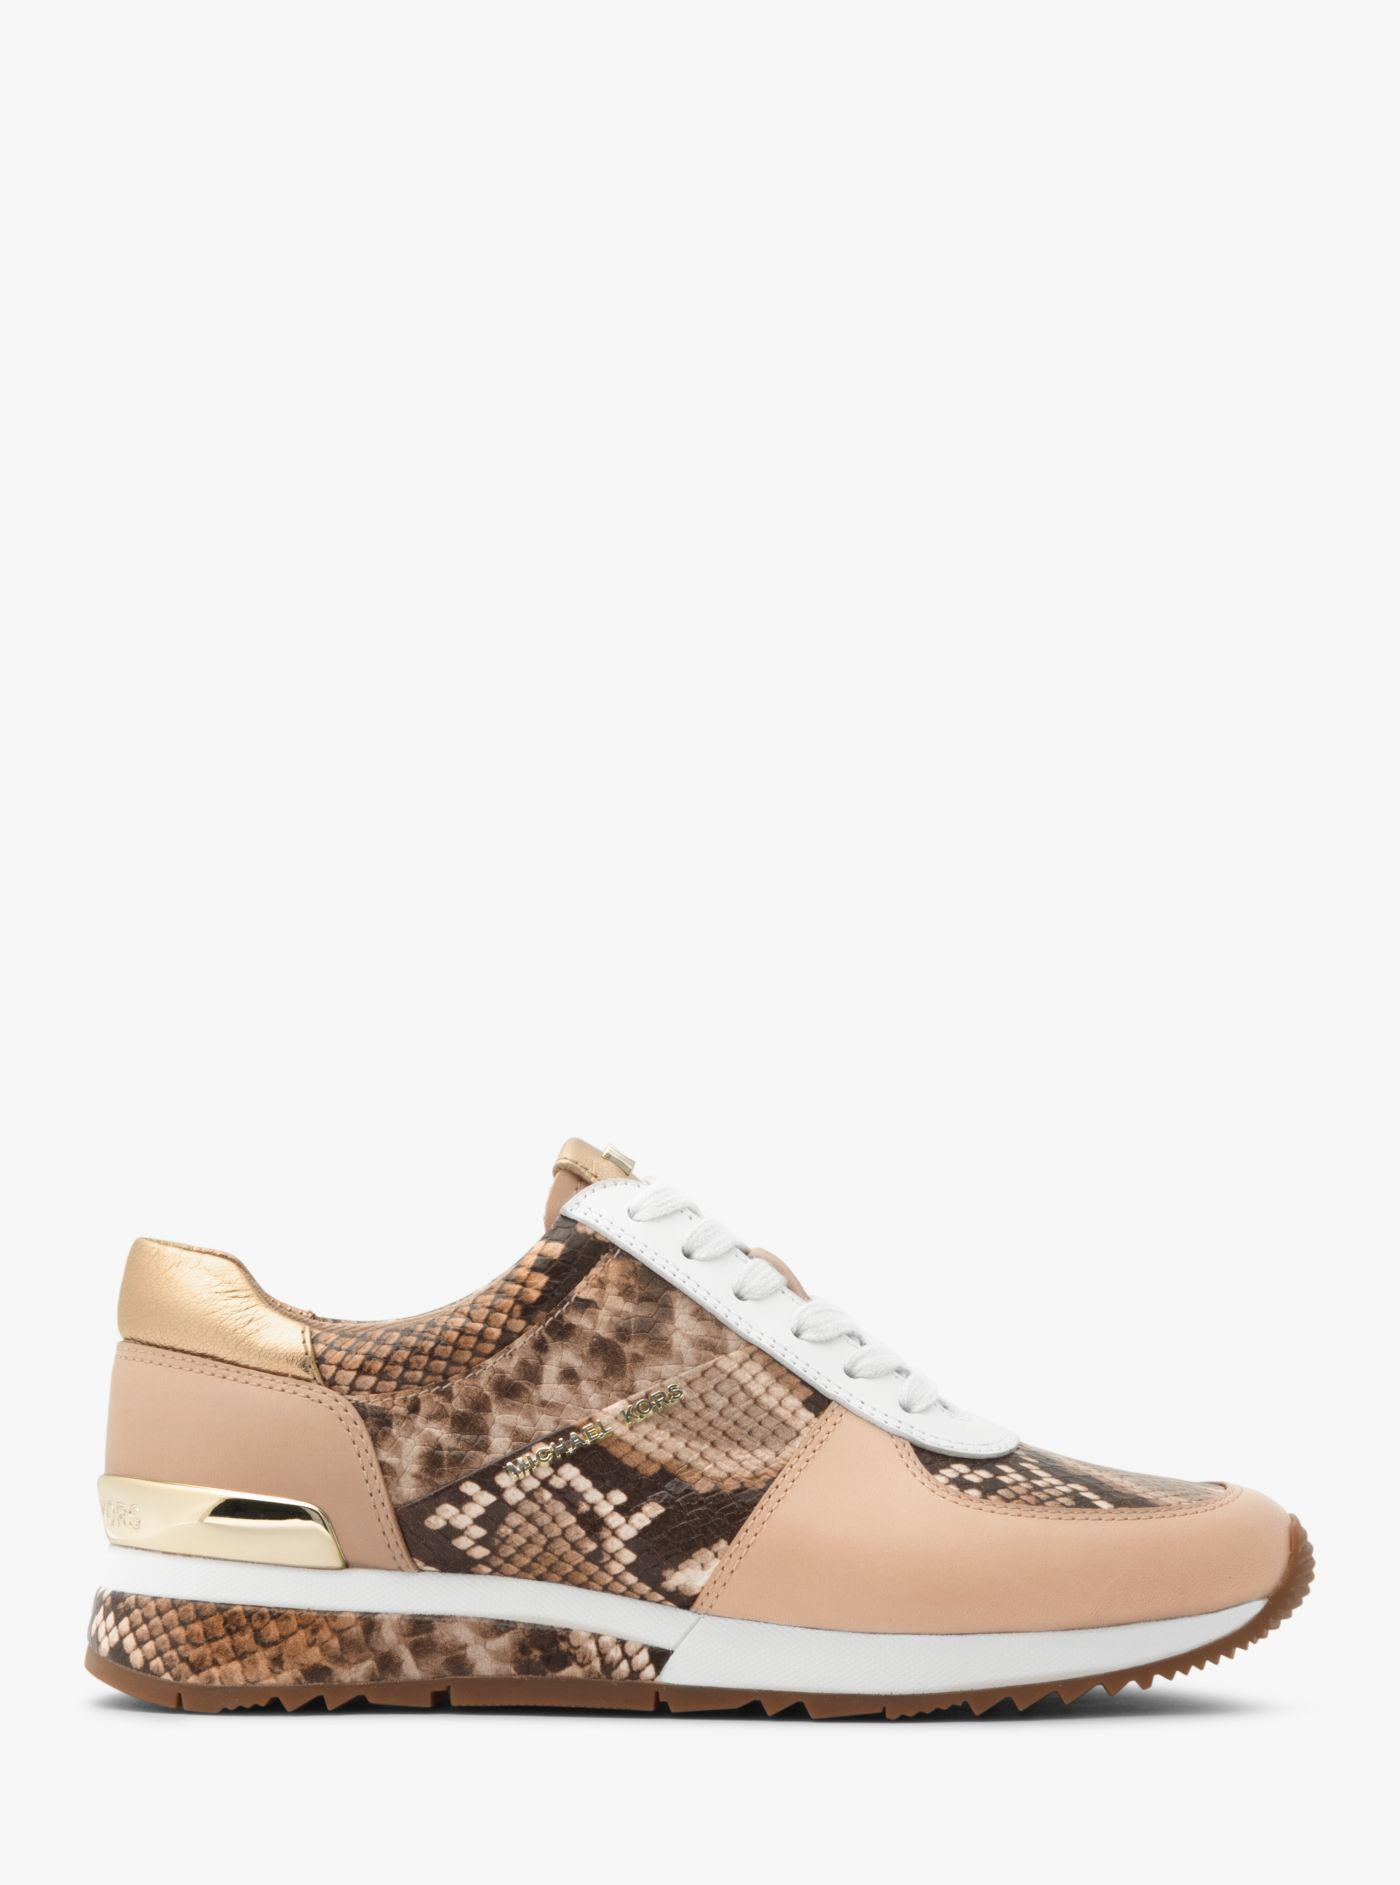 michael kors snake sneakers